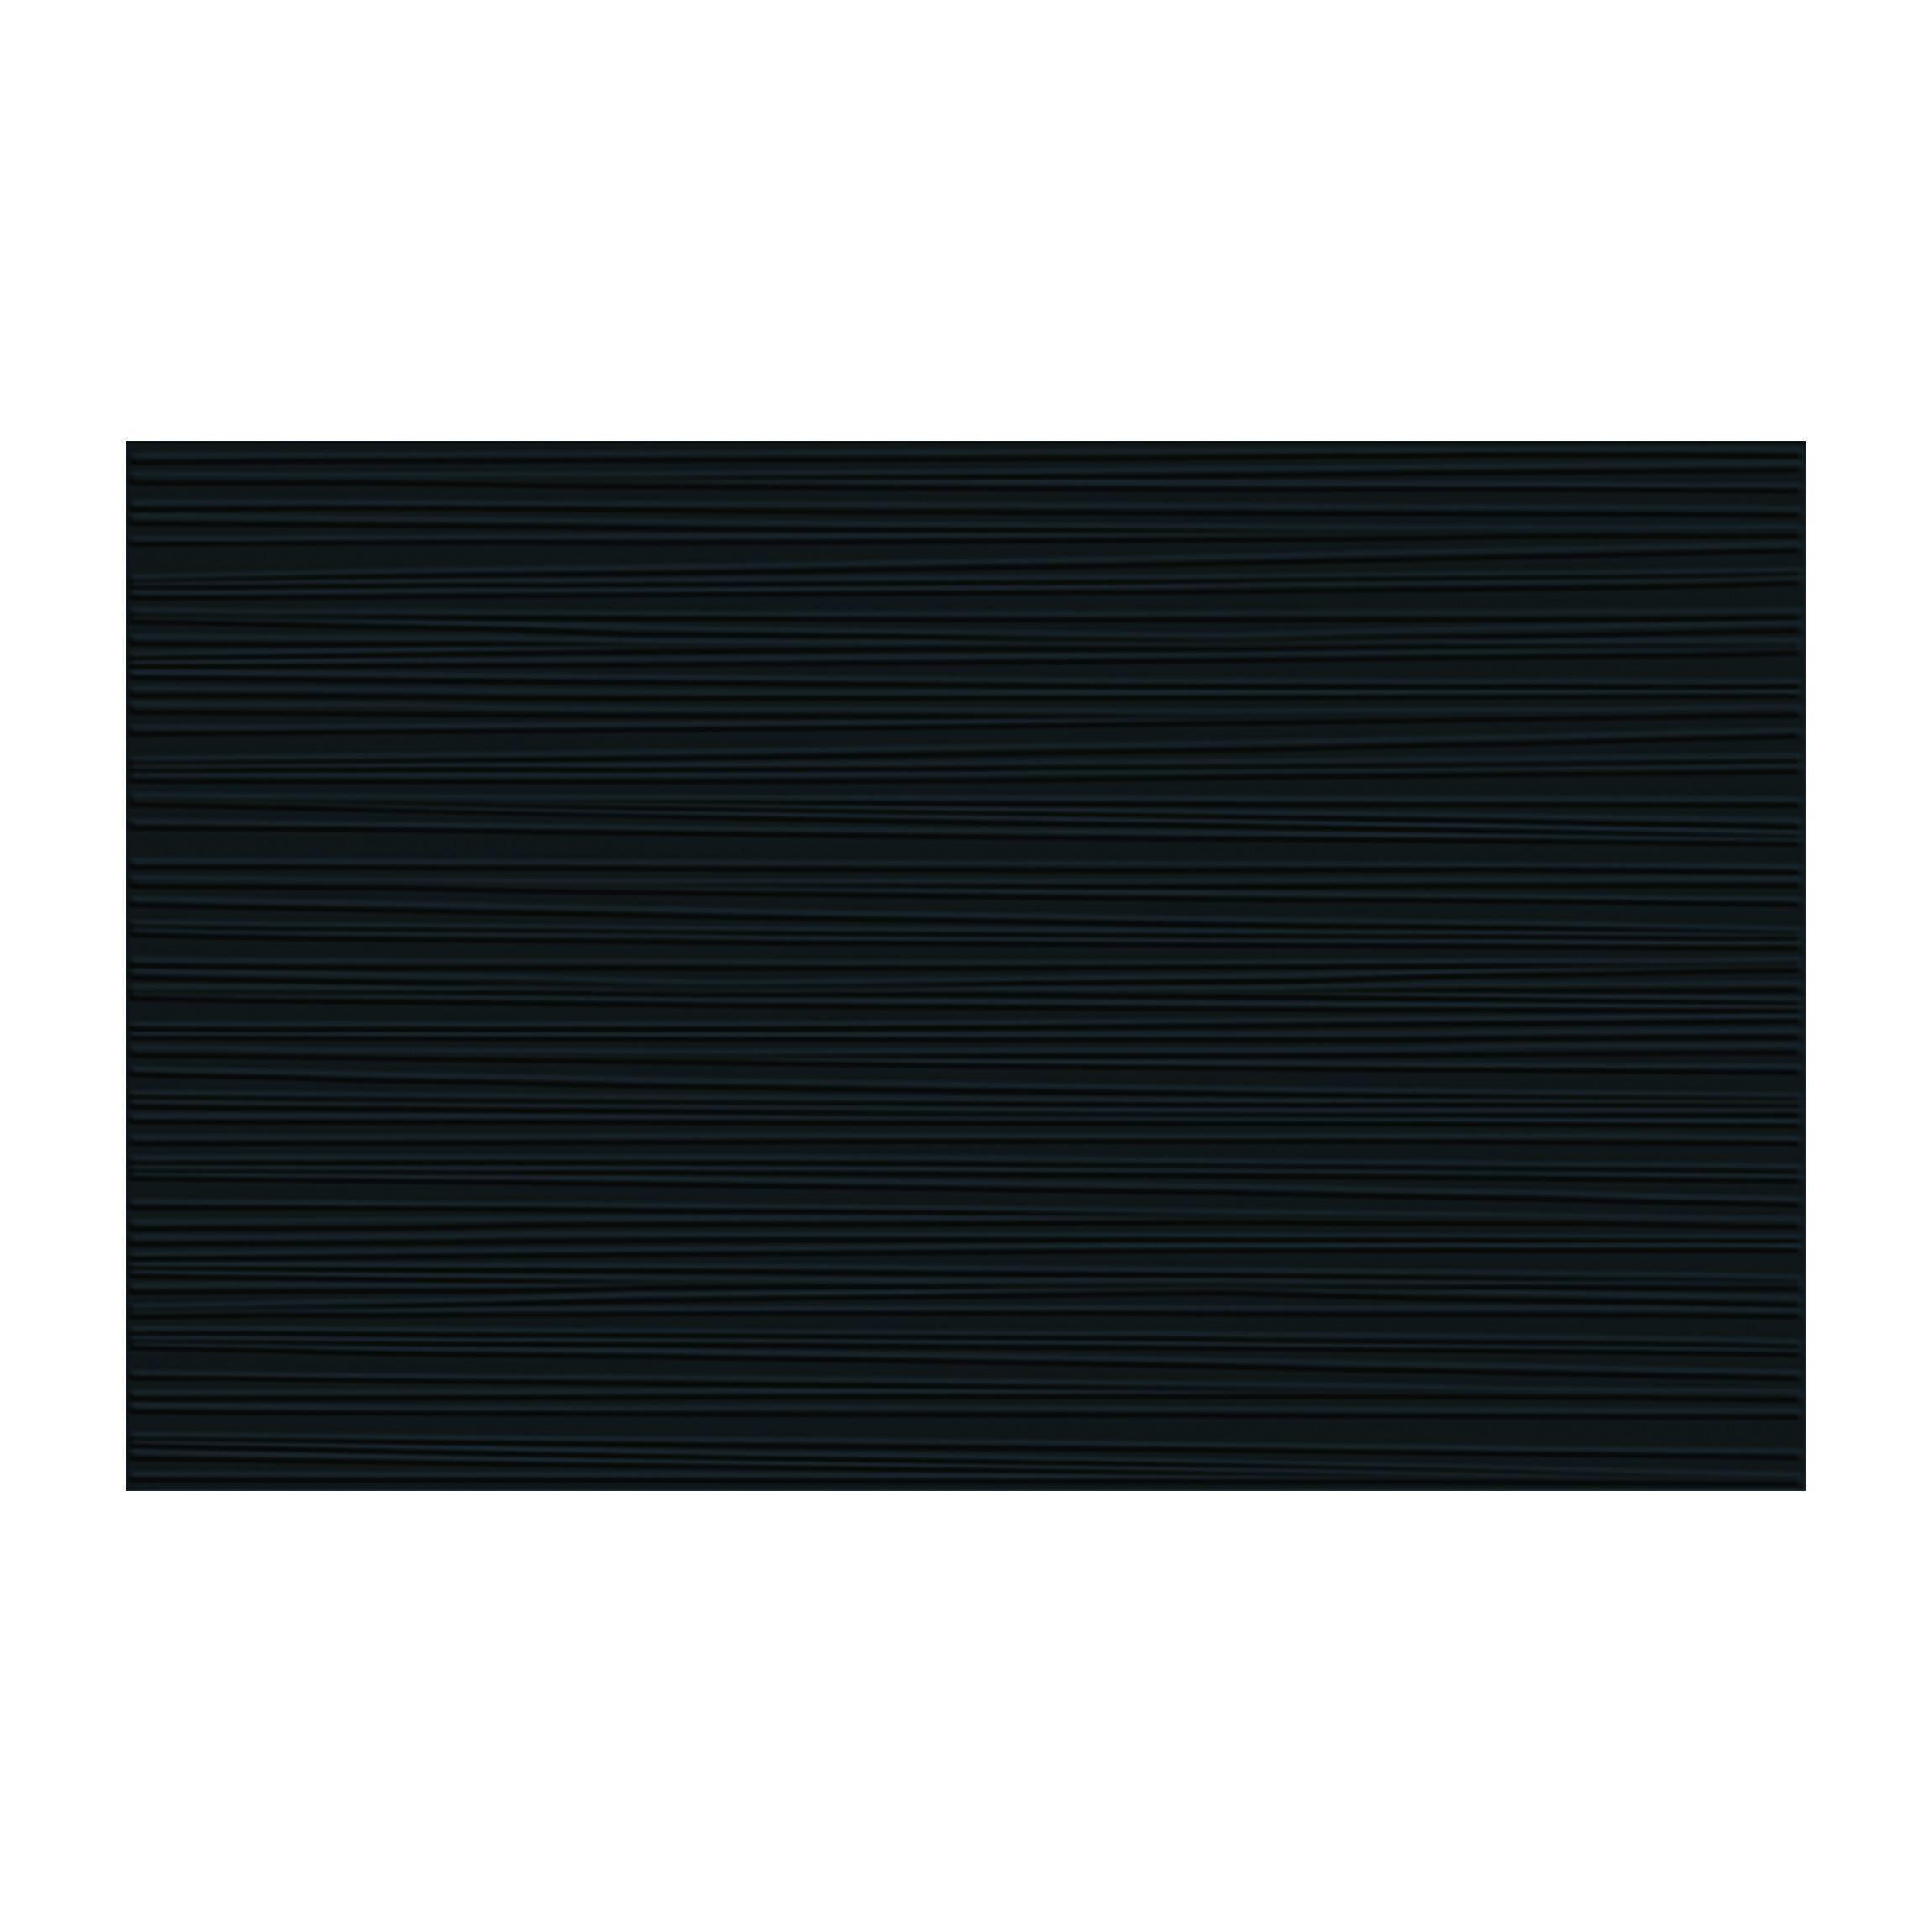 Rivestimento Royal Black 25x40x0,70 Cm Pei3 Bicottura